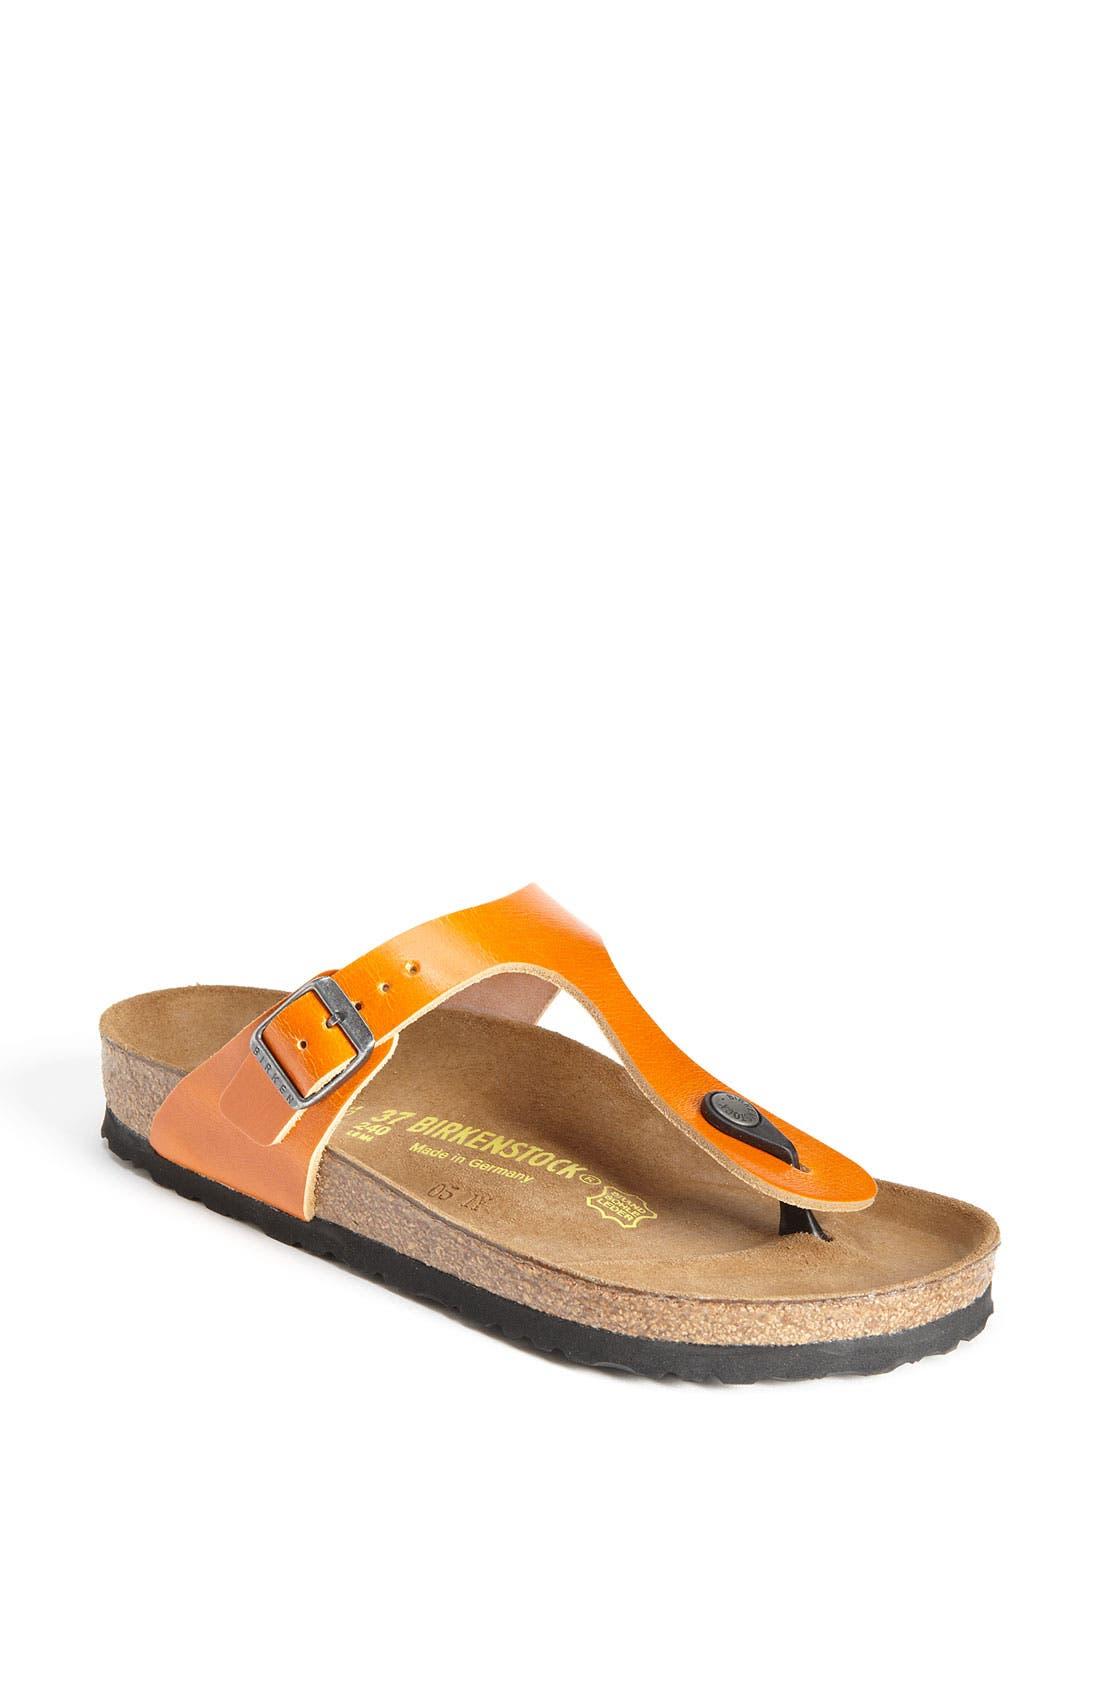 Main Image - Birkenstock 'Gizeh' Sandal (Exclusive)